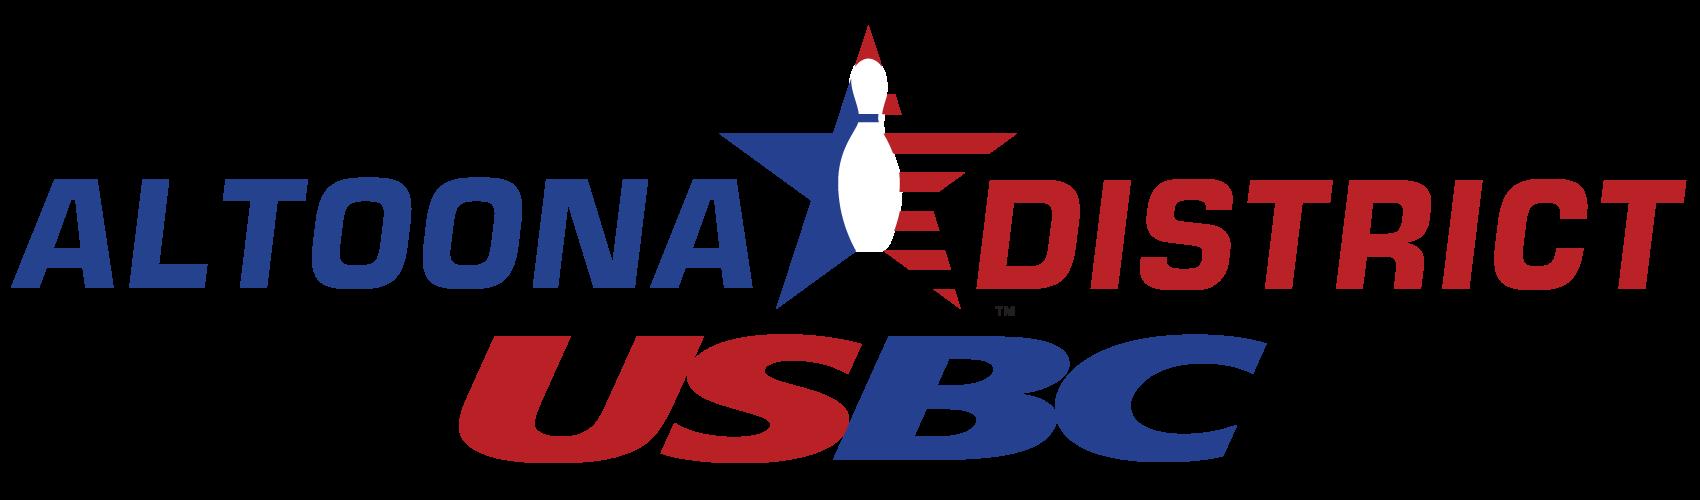 Altoona District Usbc Association